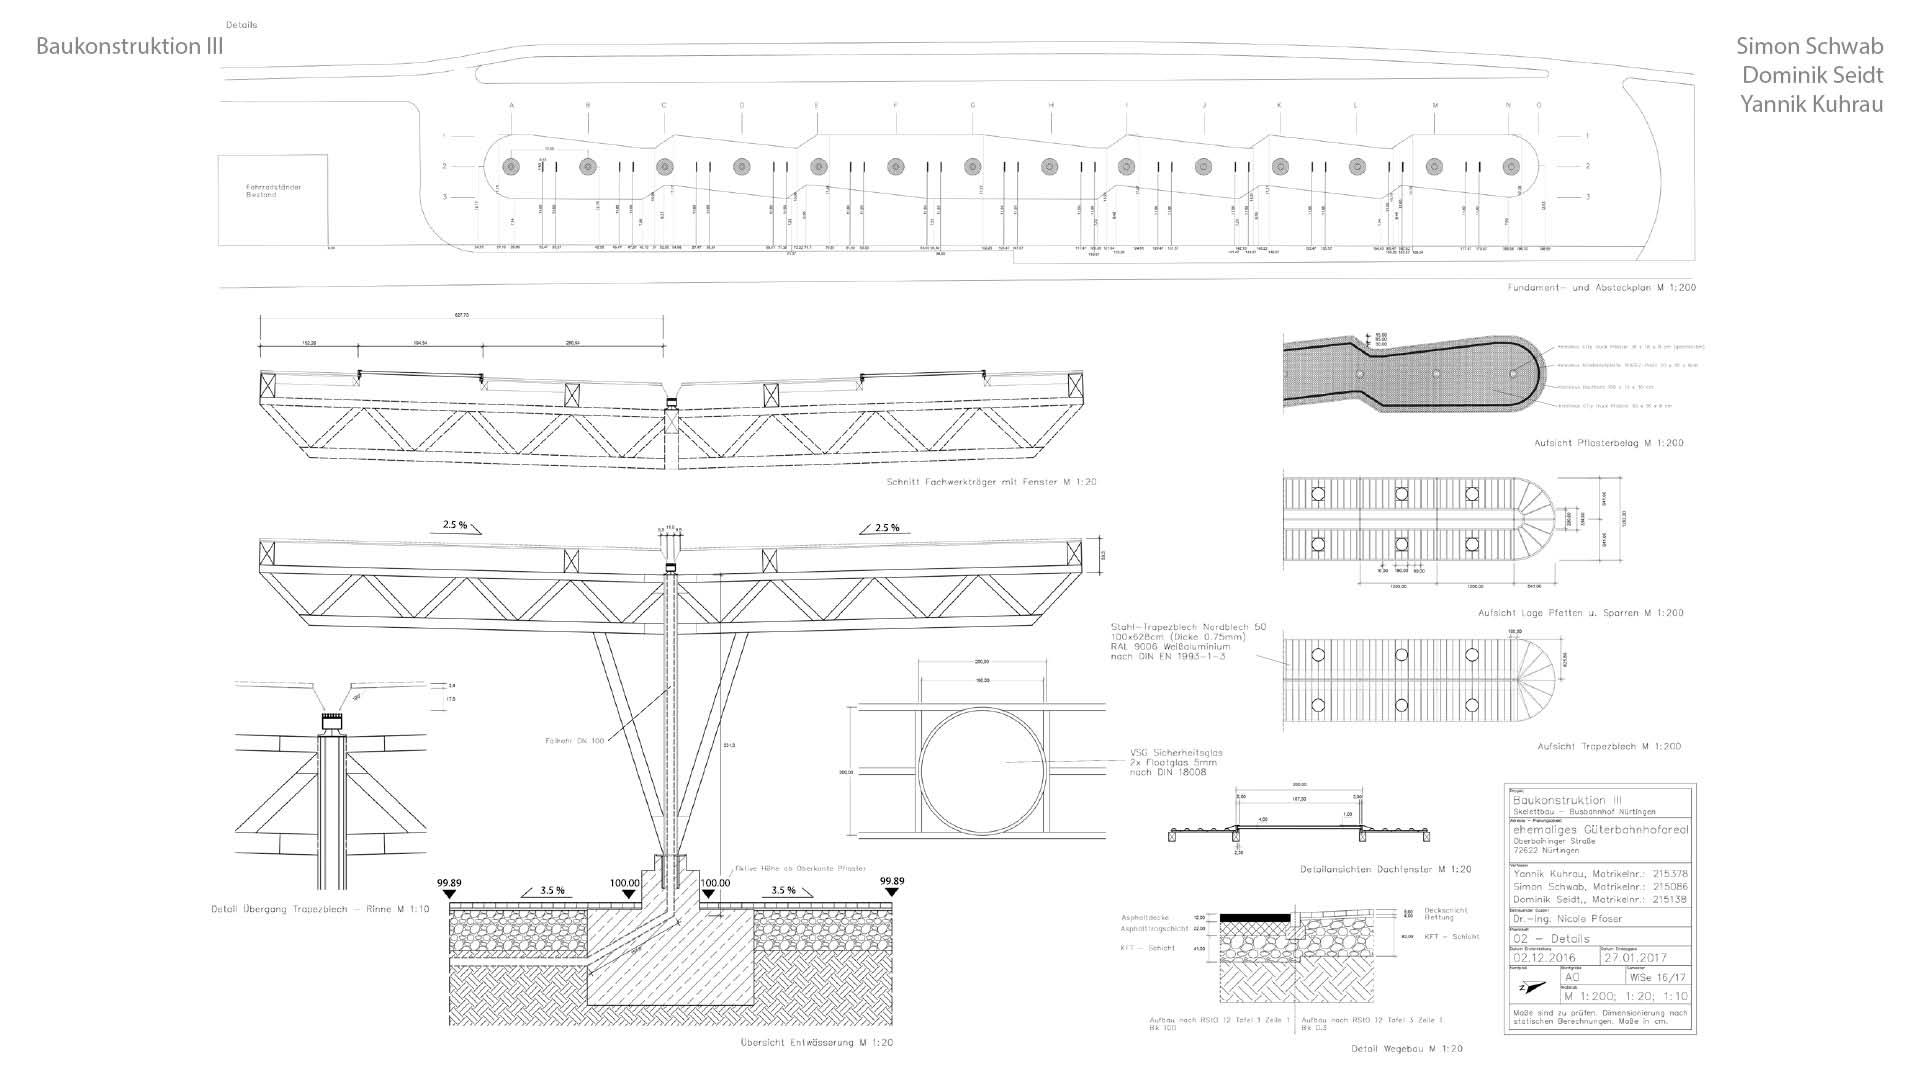 02 16 3 Baukonstruktion 3